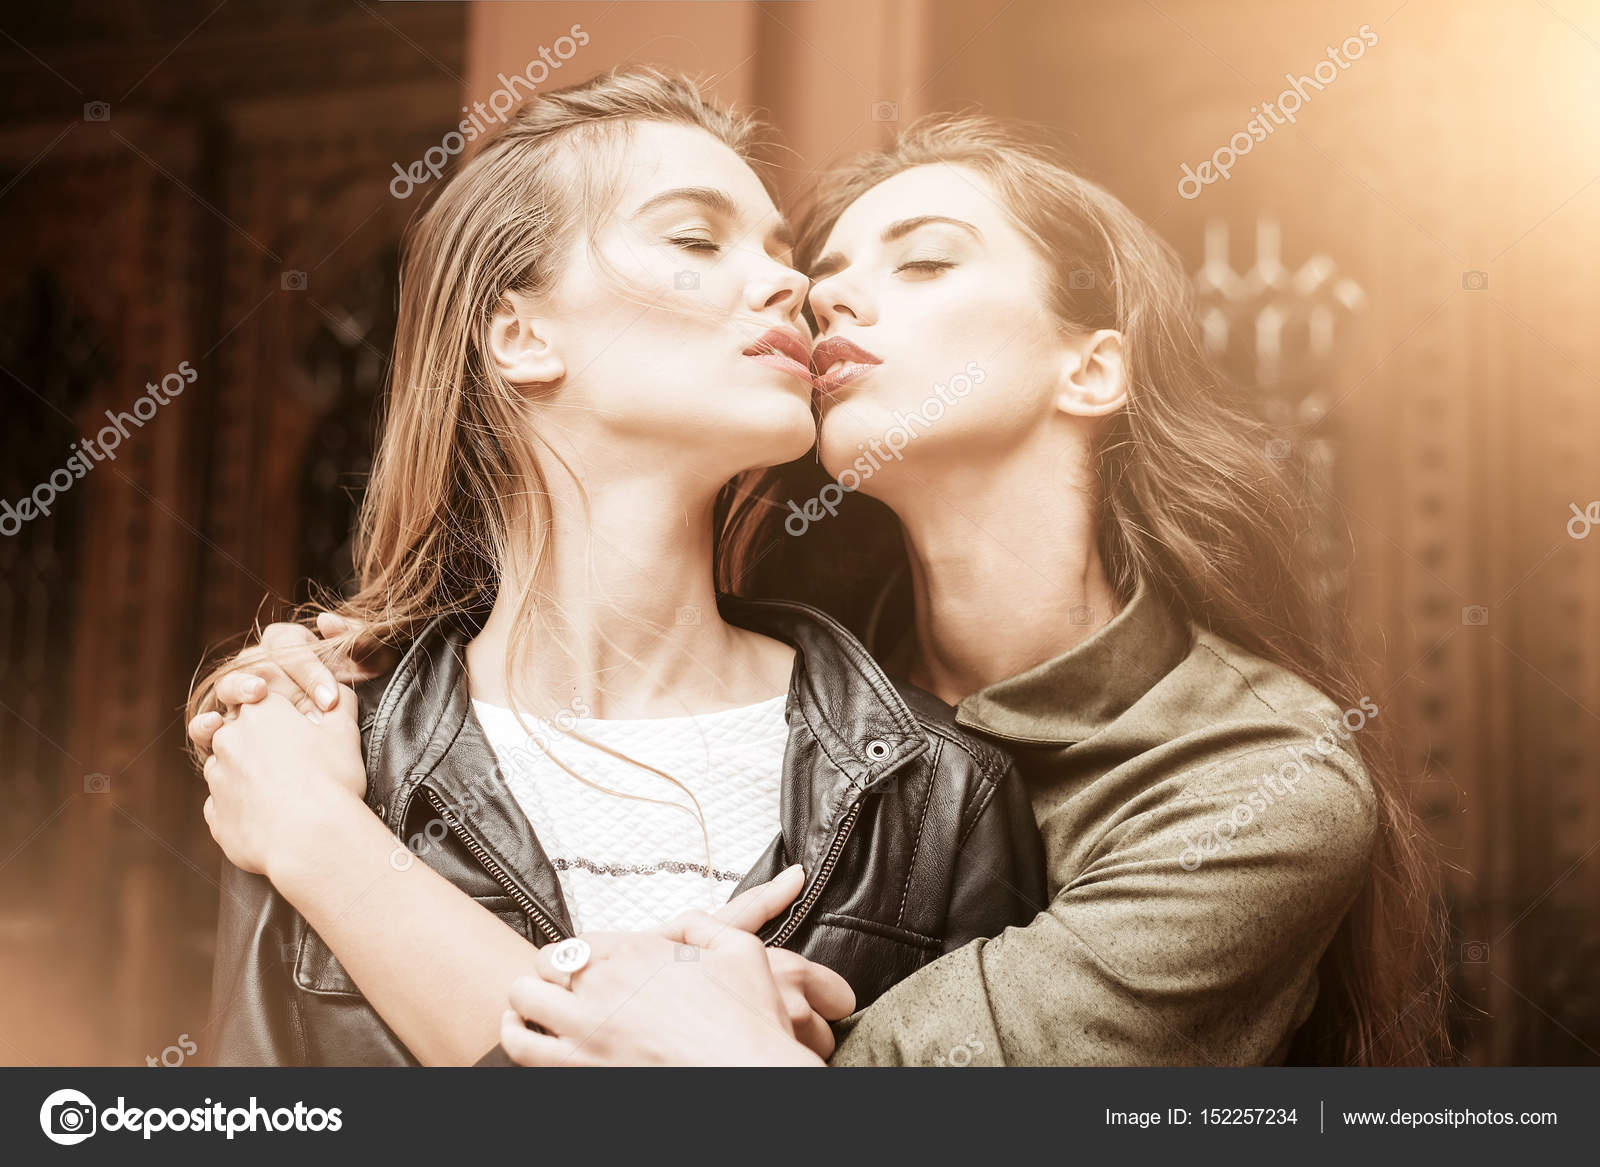 twee meisjes zoenen Videos